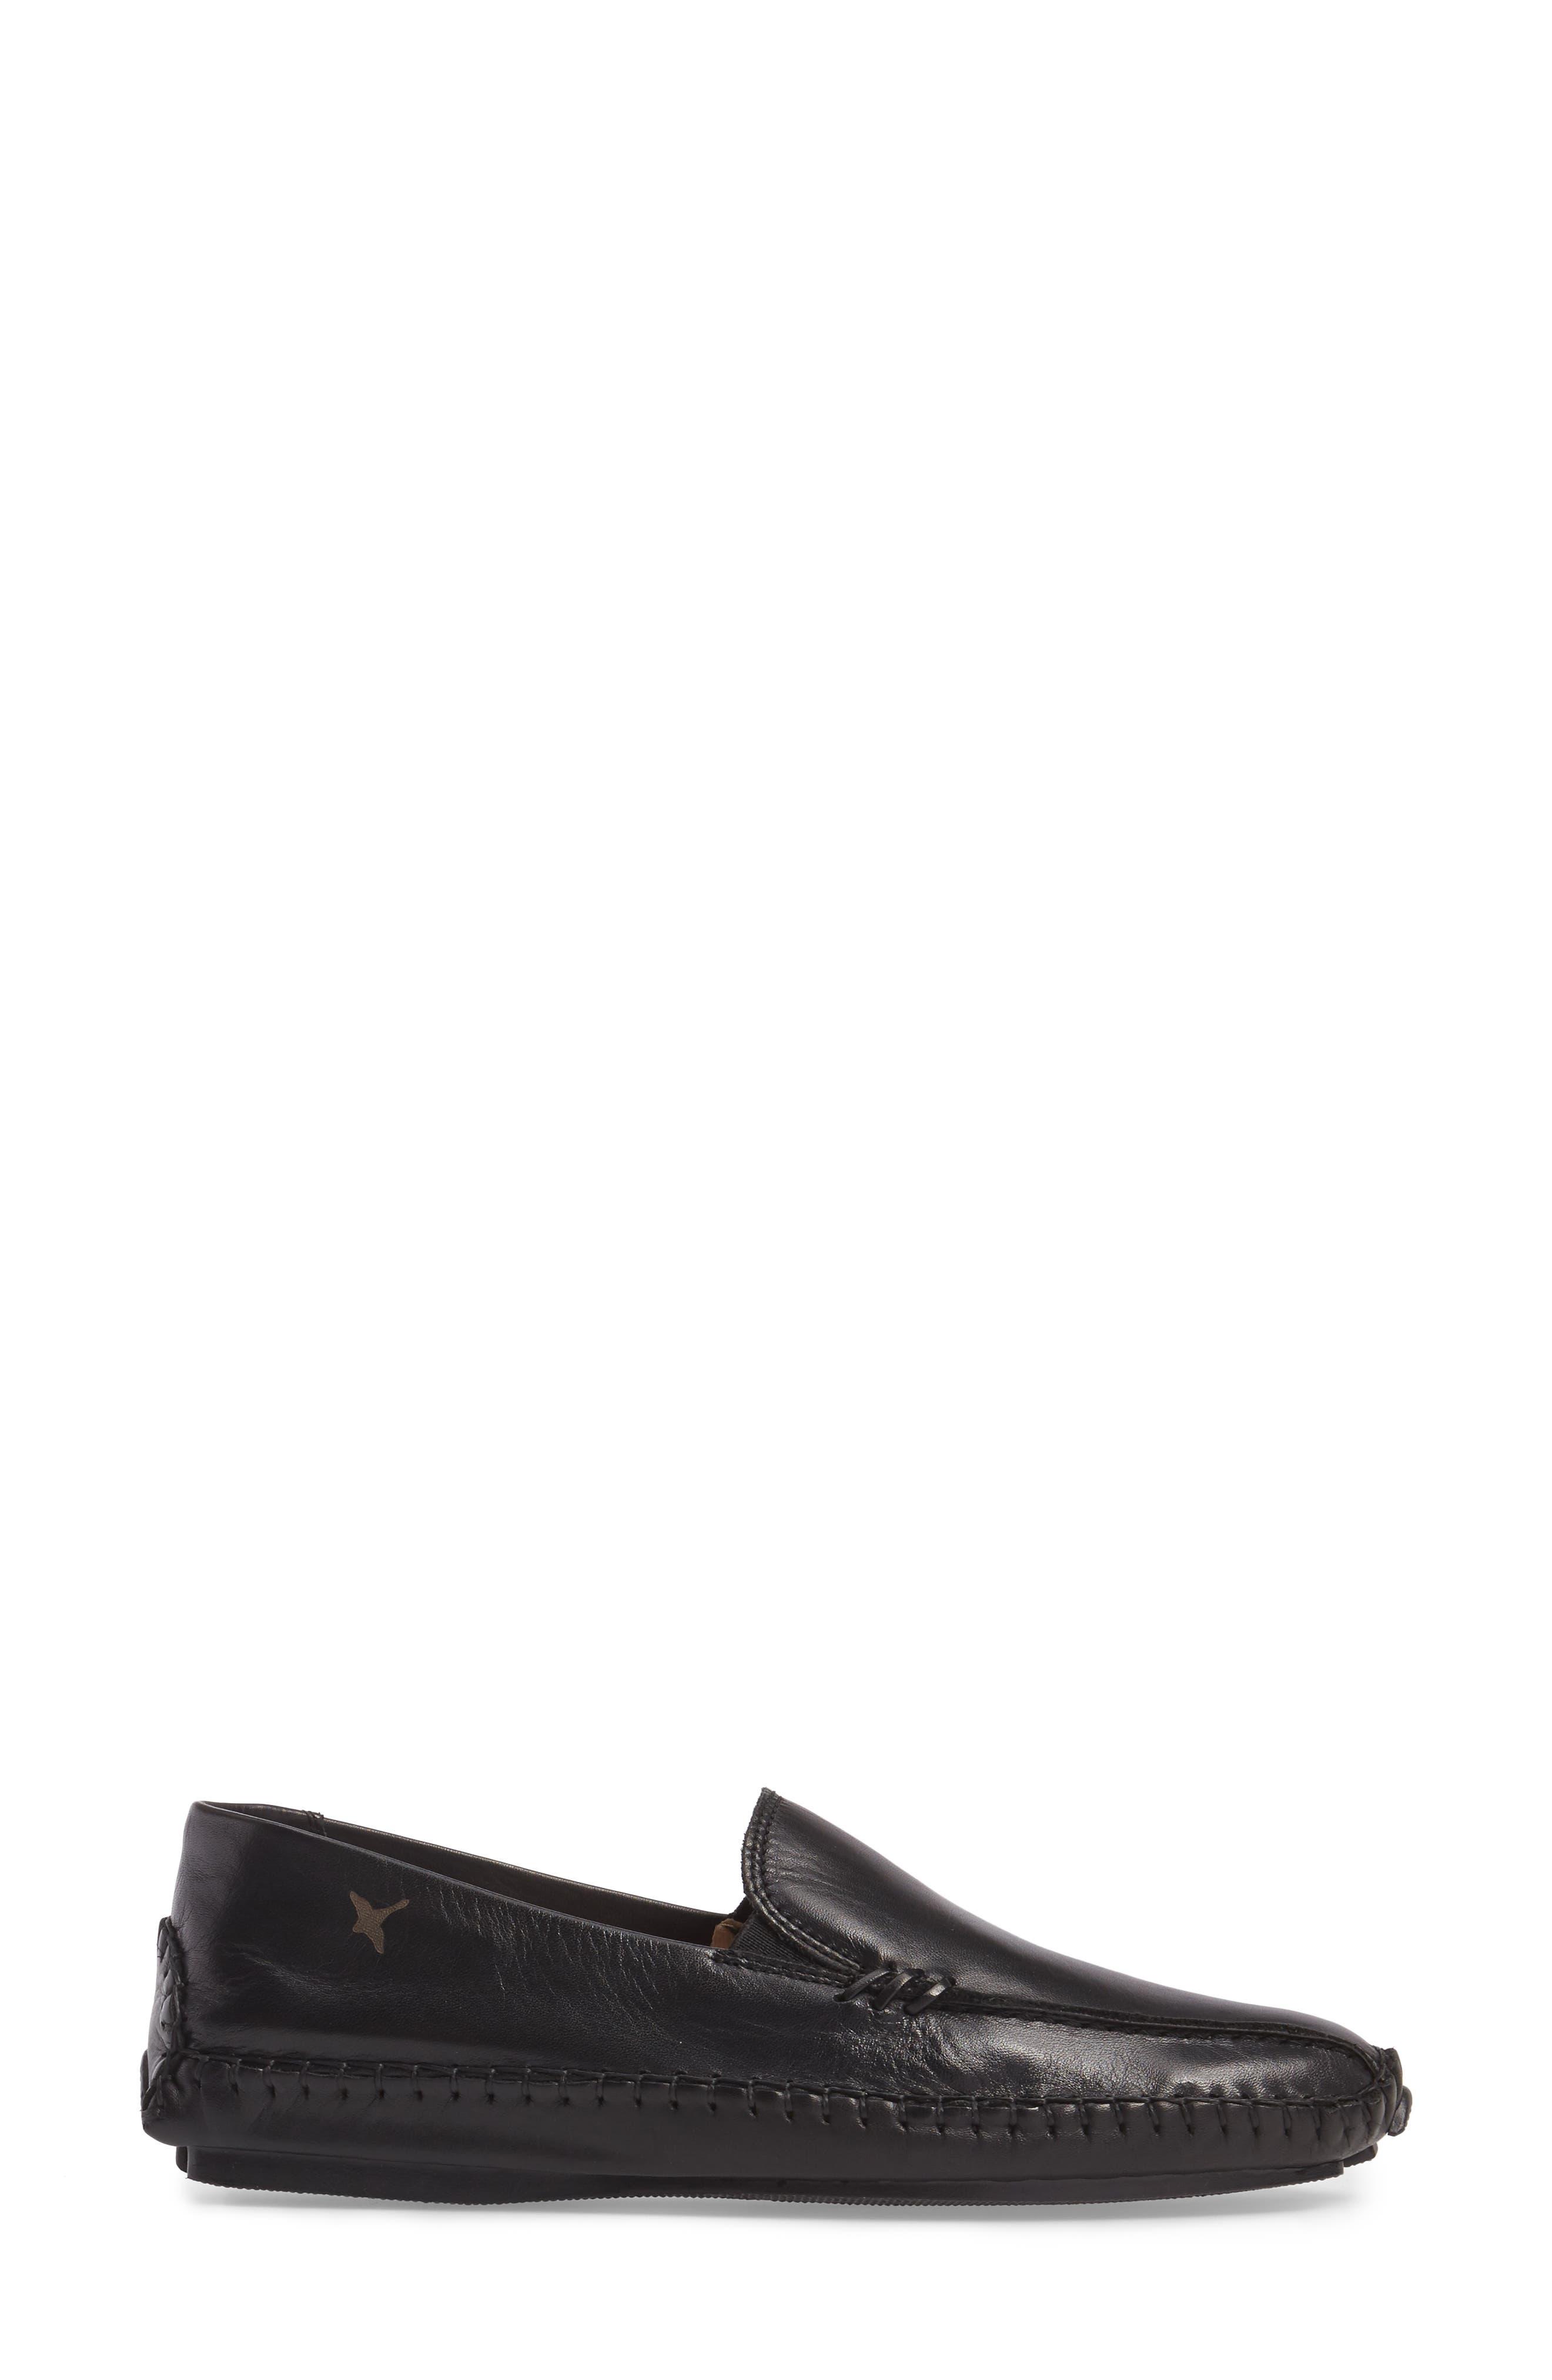 Jerez Loafer,                             Alternate thumbnail 3, color,                             BLACK LEATHER